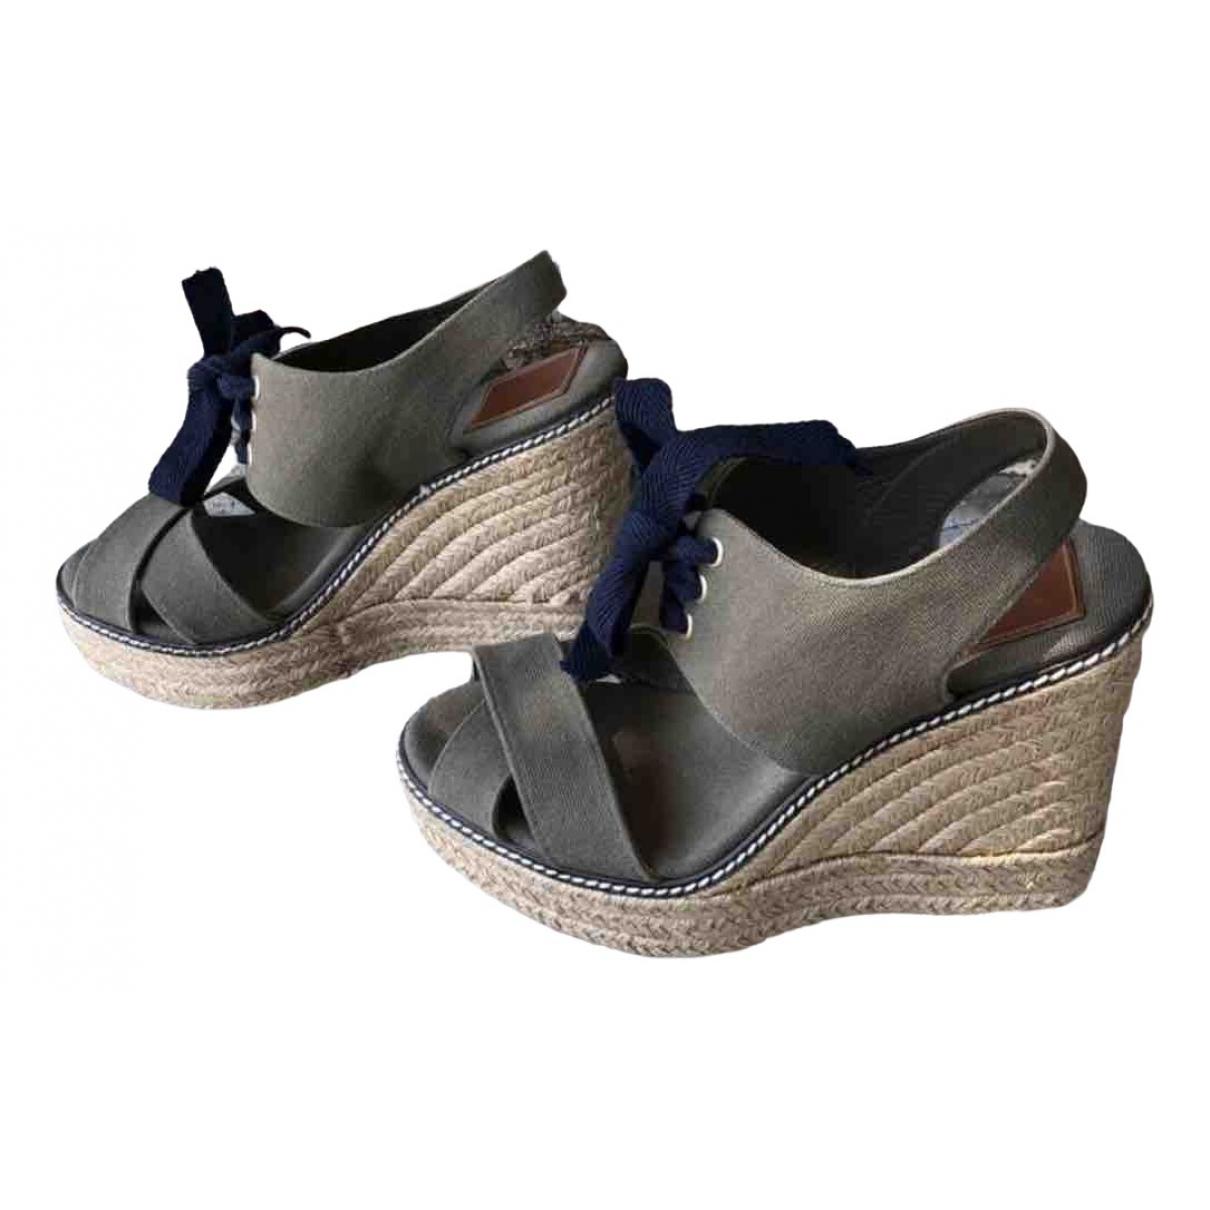 Sandalias romanas de Lona Tory Burch